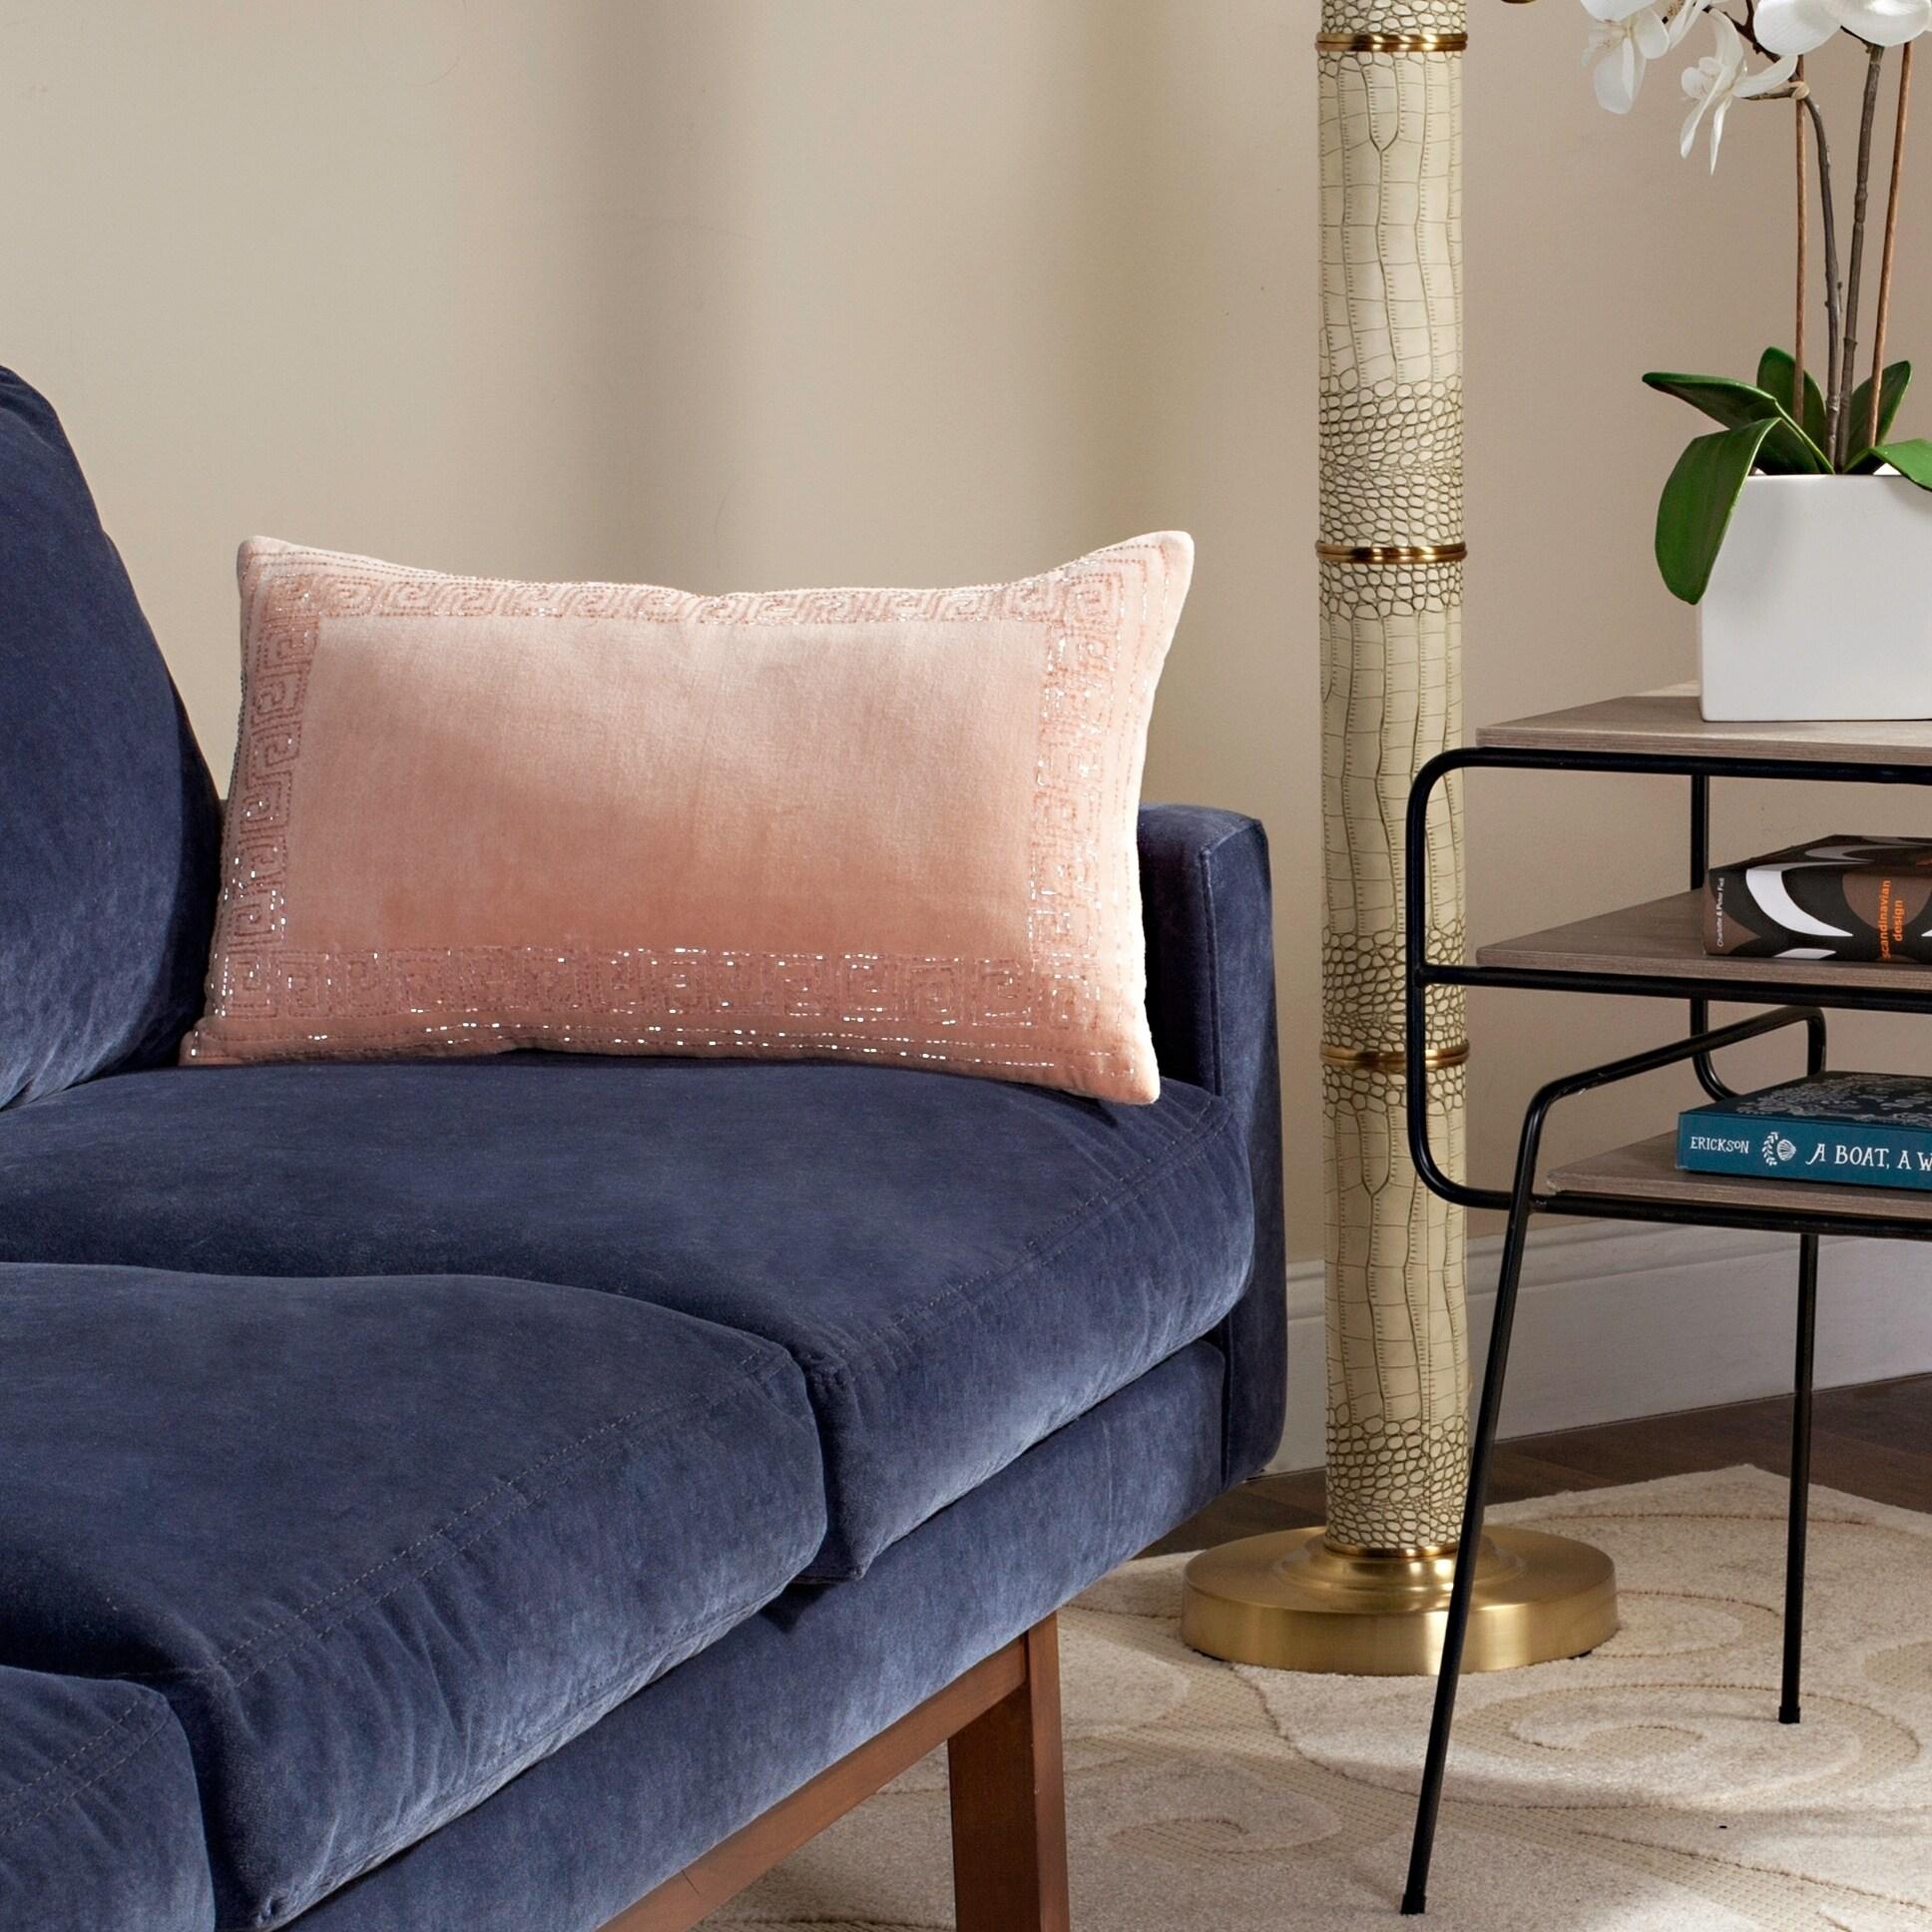 Safavieh 20 Inch Morrocan Border Blush Decorative Pillow Overstock 13784459